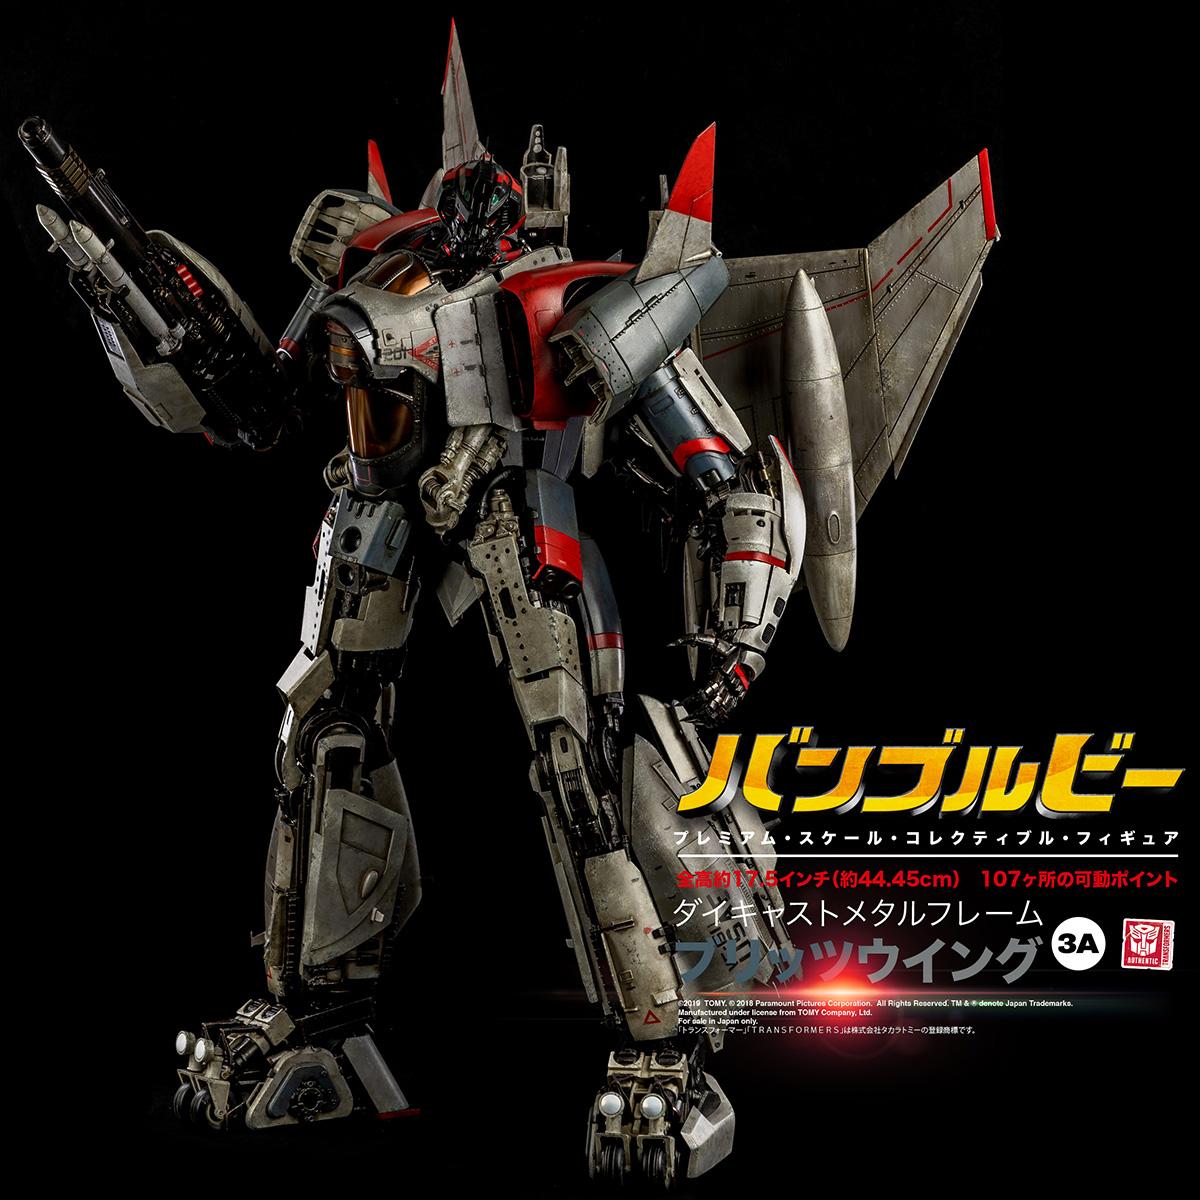 Blitzwing_PM_JAP_1028.jpg